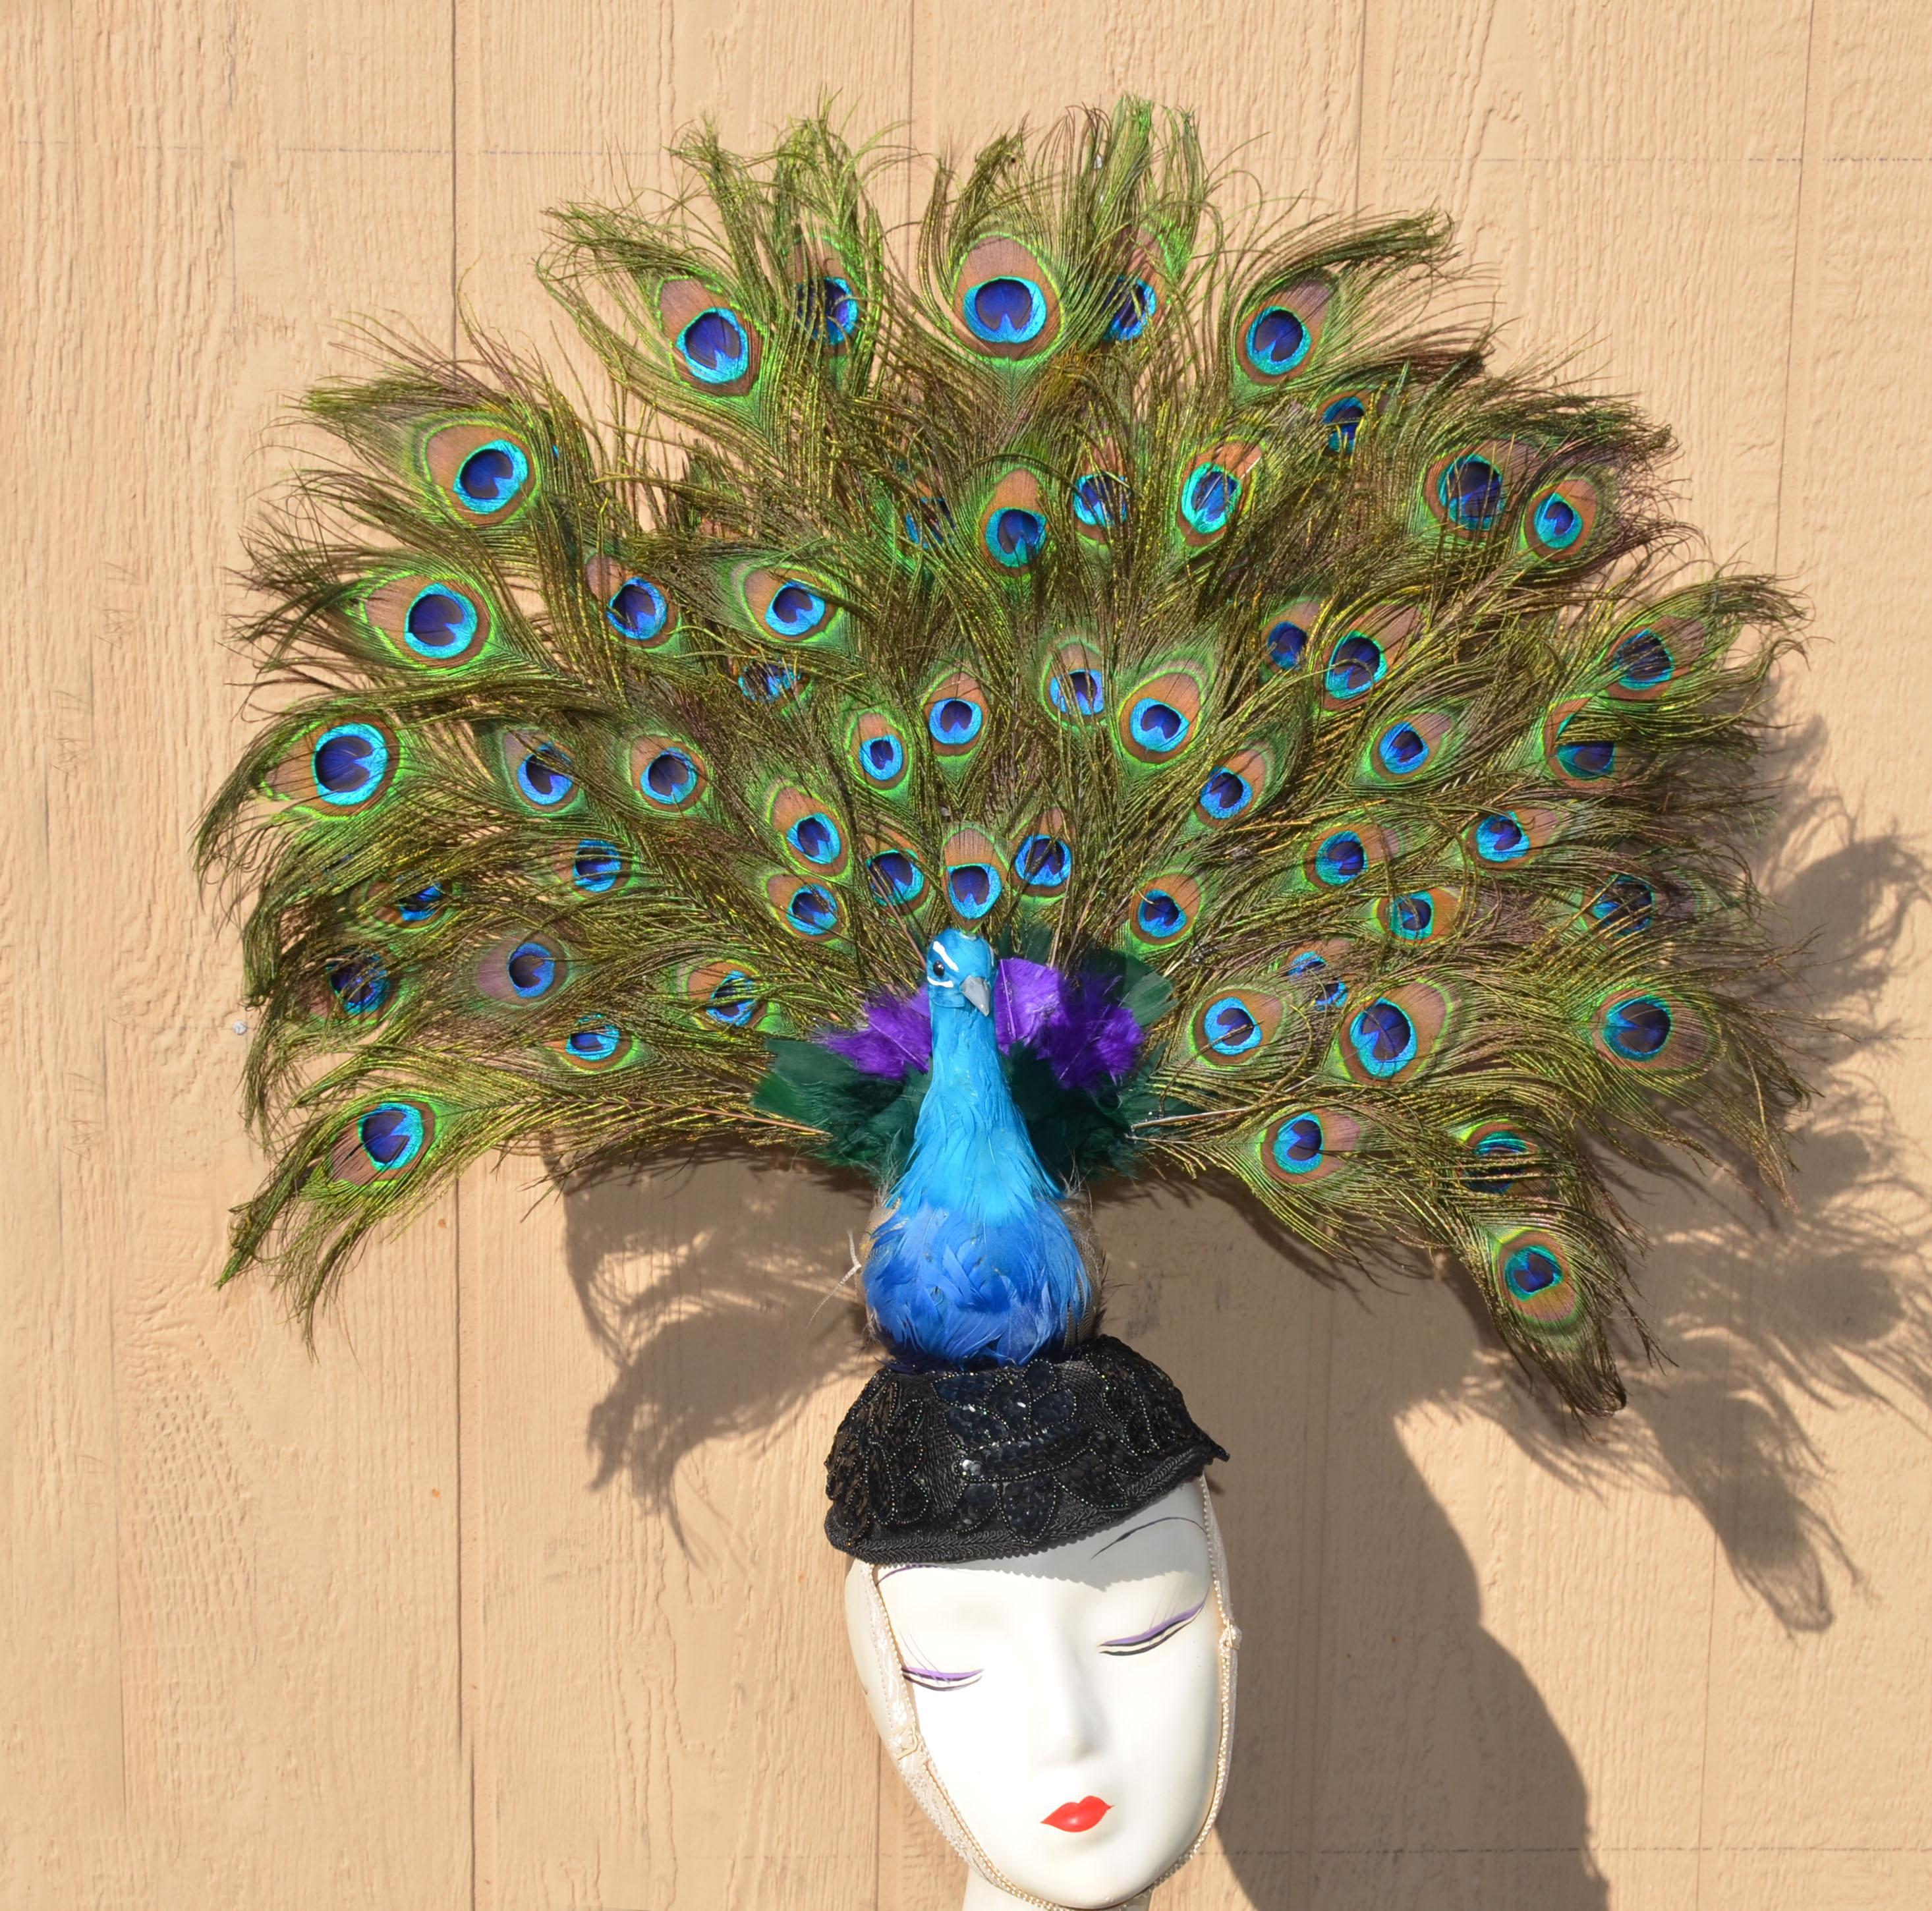 Peacock Tail Fan Headpiece Costume